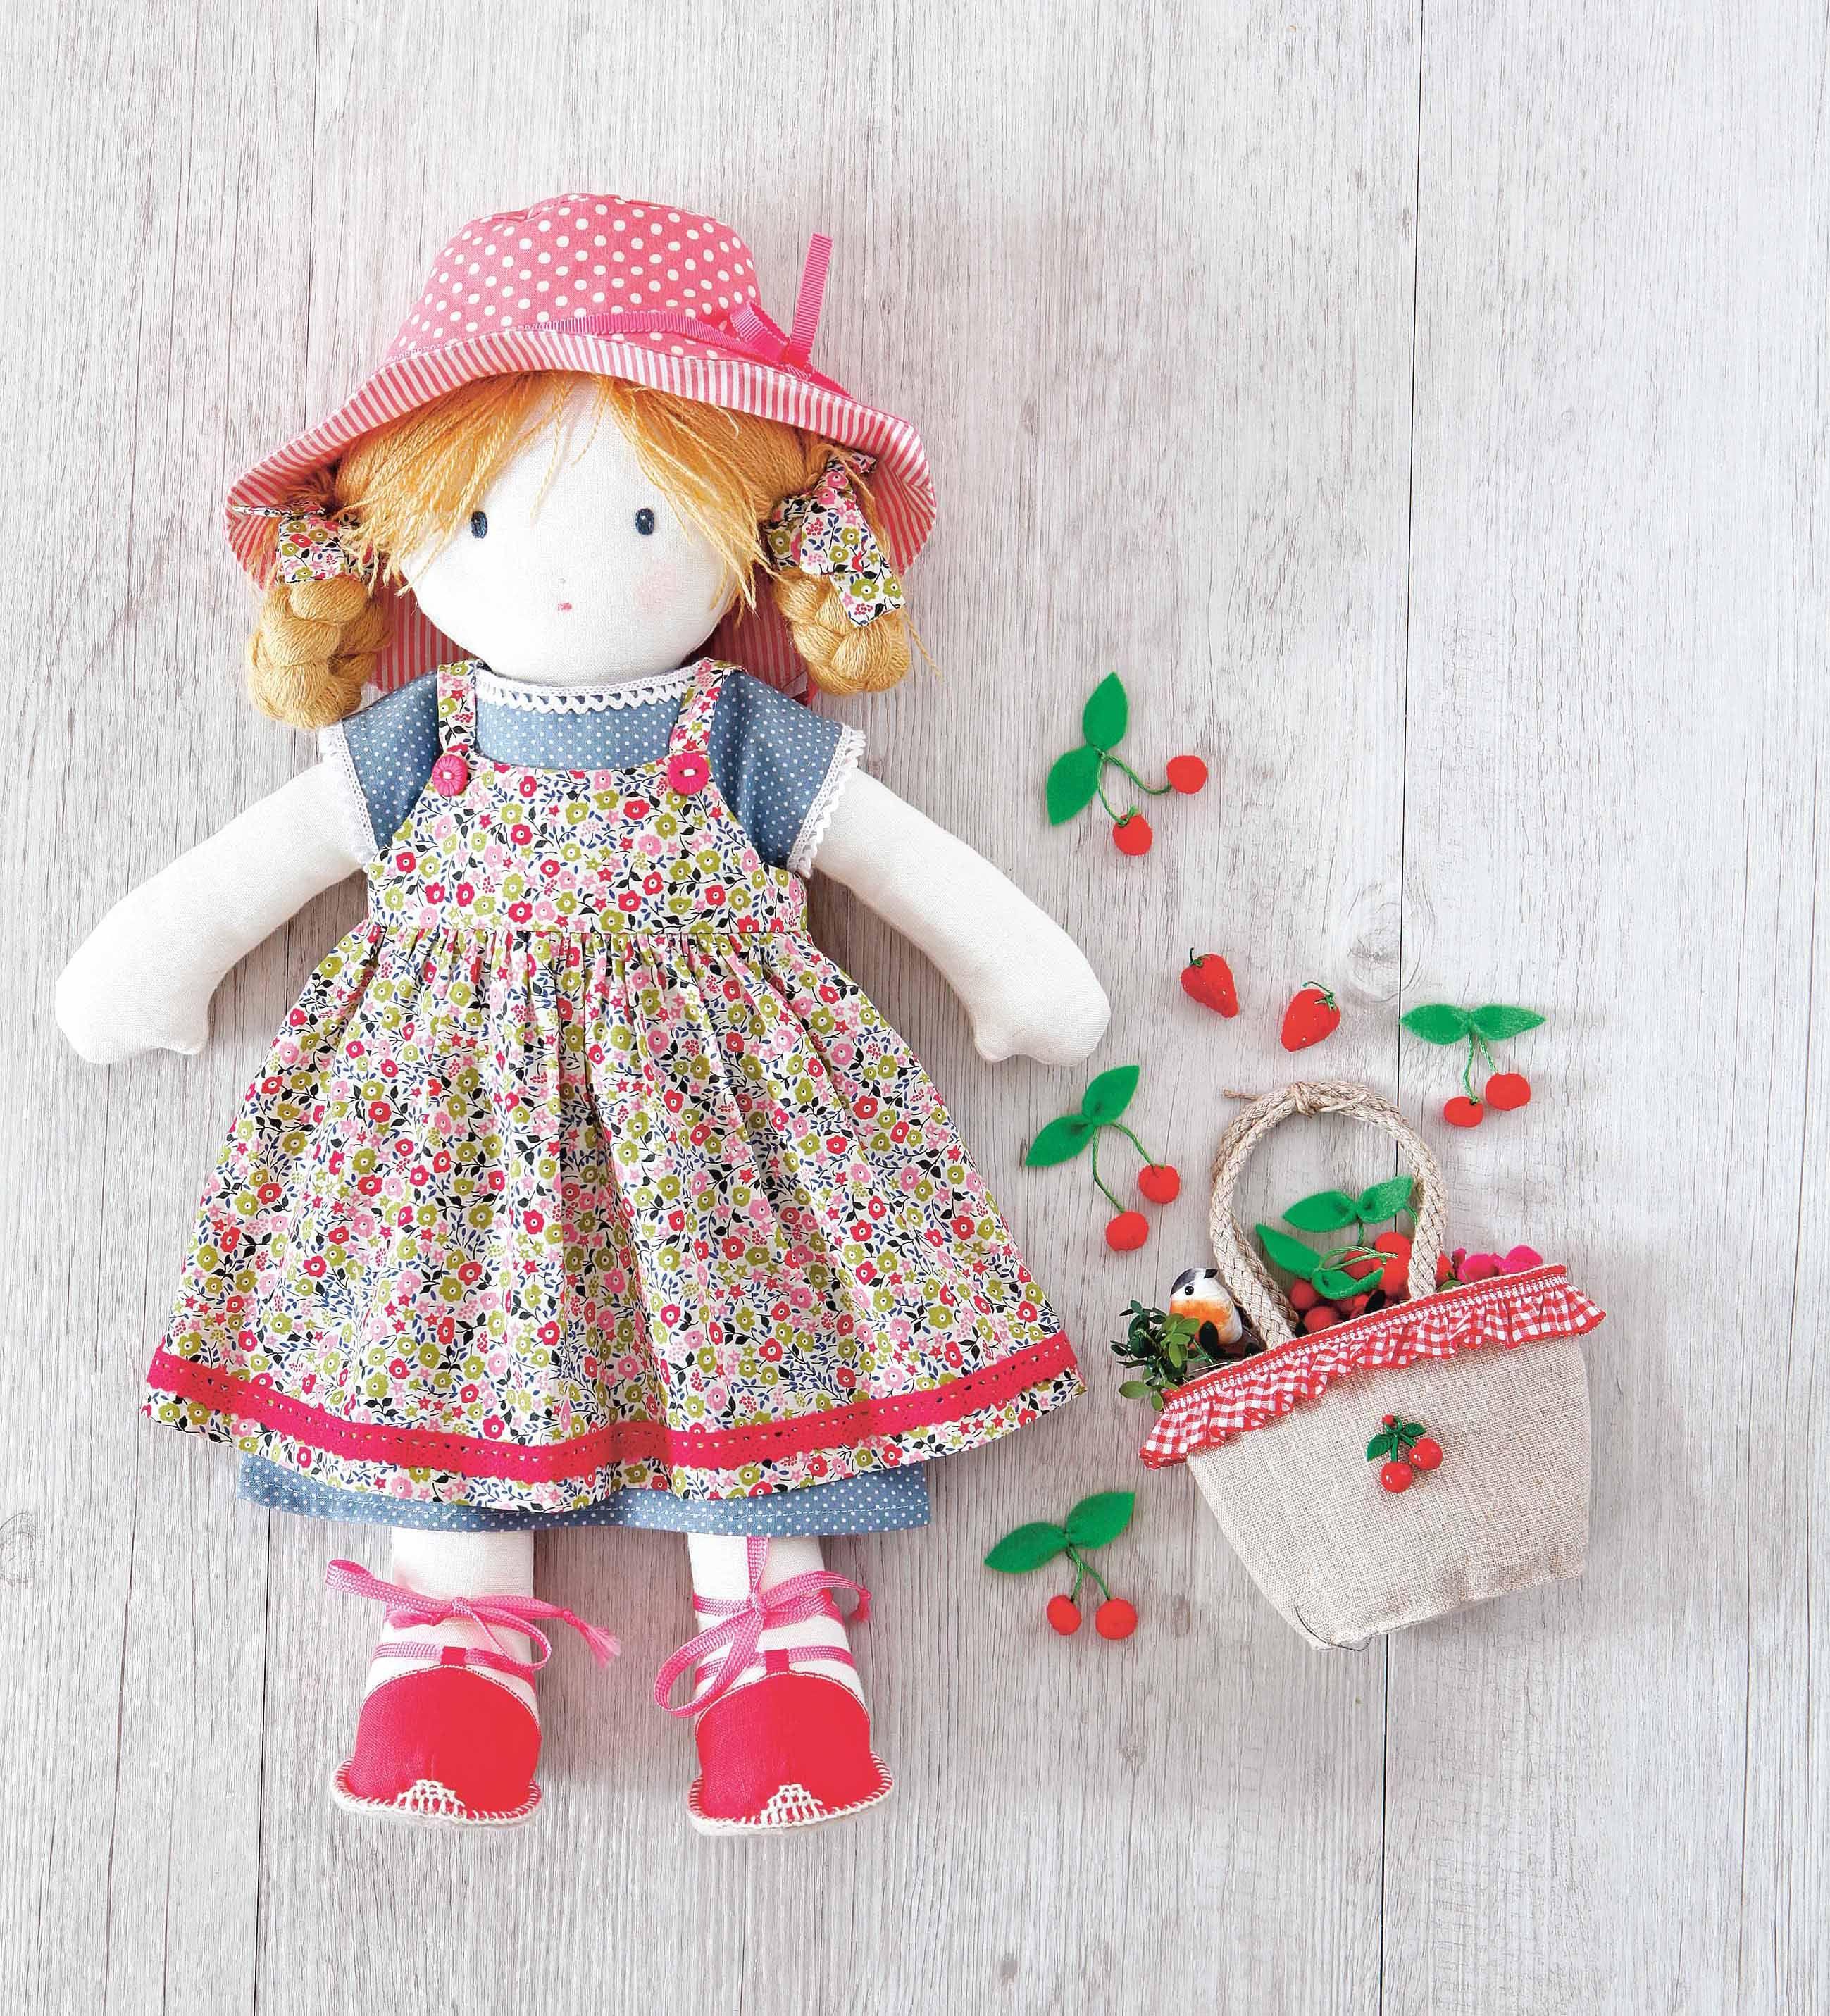 Pattern: Printable Rag Doll Sewing Pattern | Sewing | Pinterest - Free Printable Cloth Doll Sewing Patterns